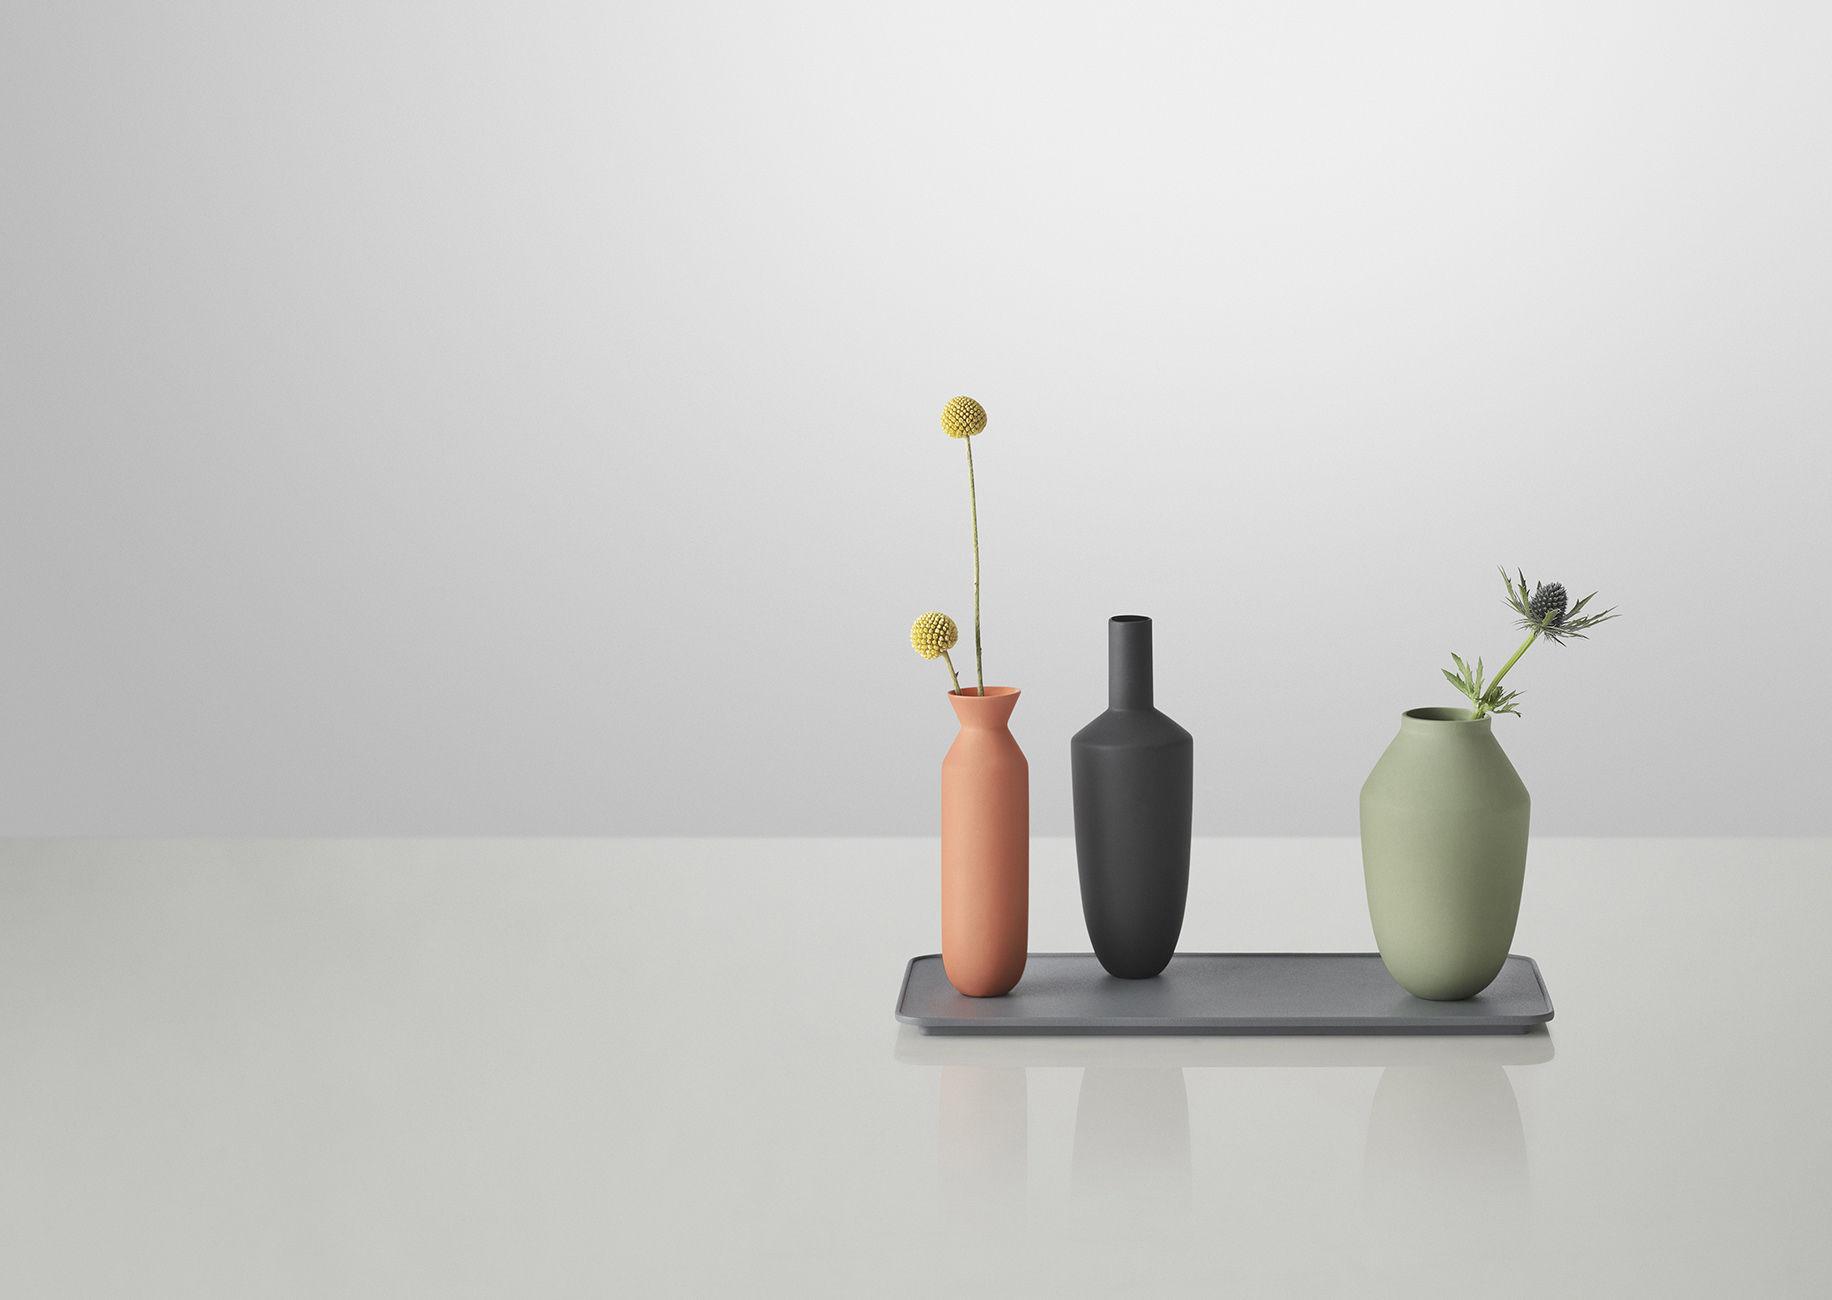 Vase balance set plateau 3 vases aimant s vases mandarine vert noir plateau gris muuto - Koziol balances ...